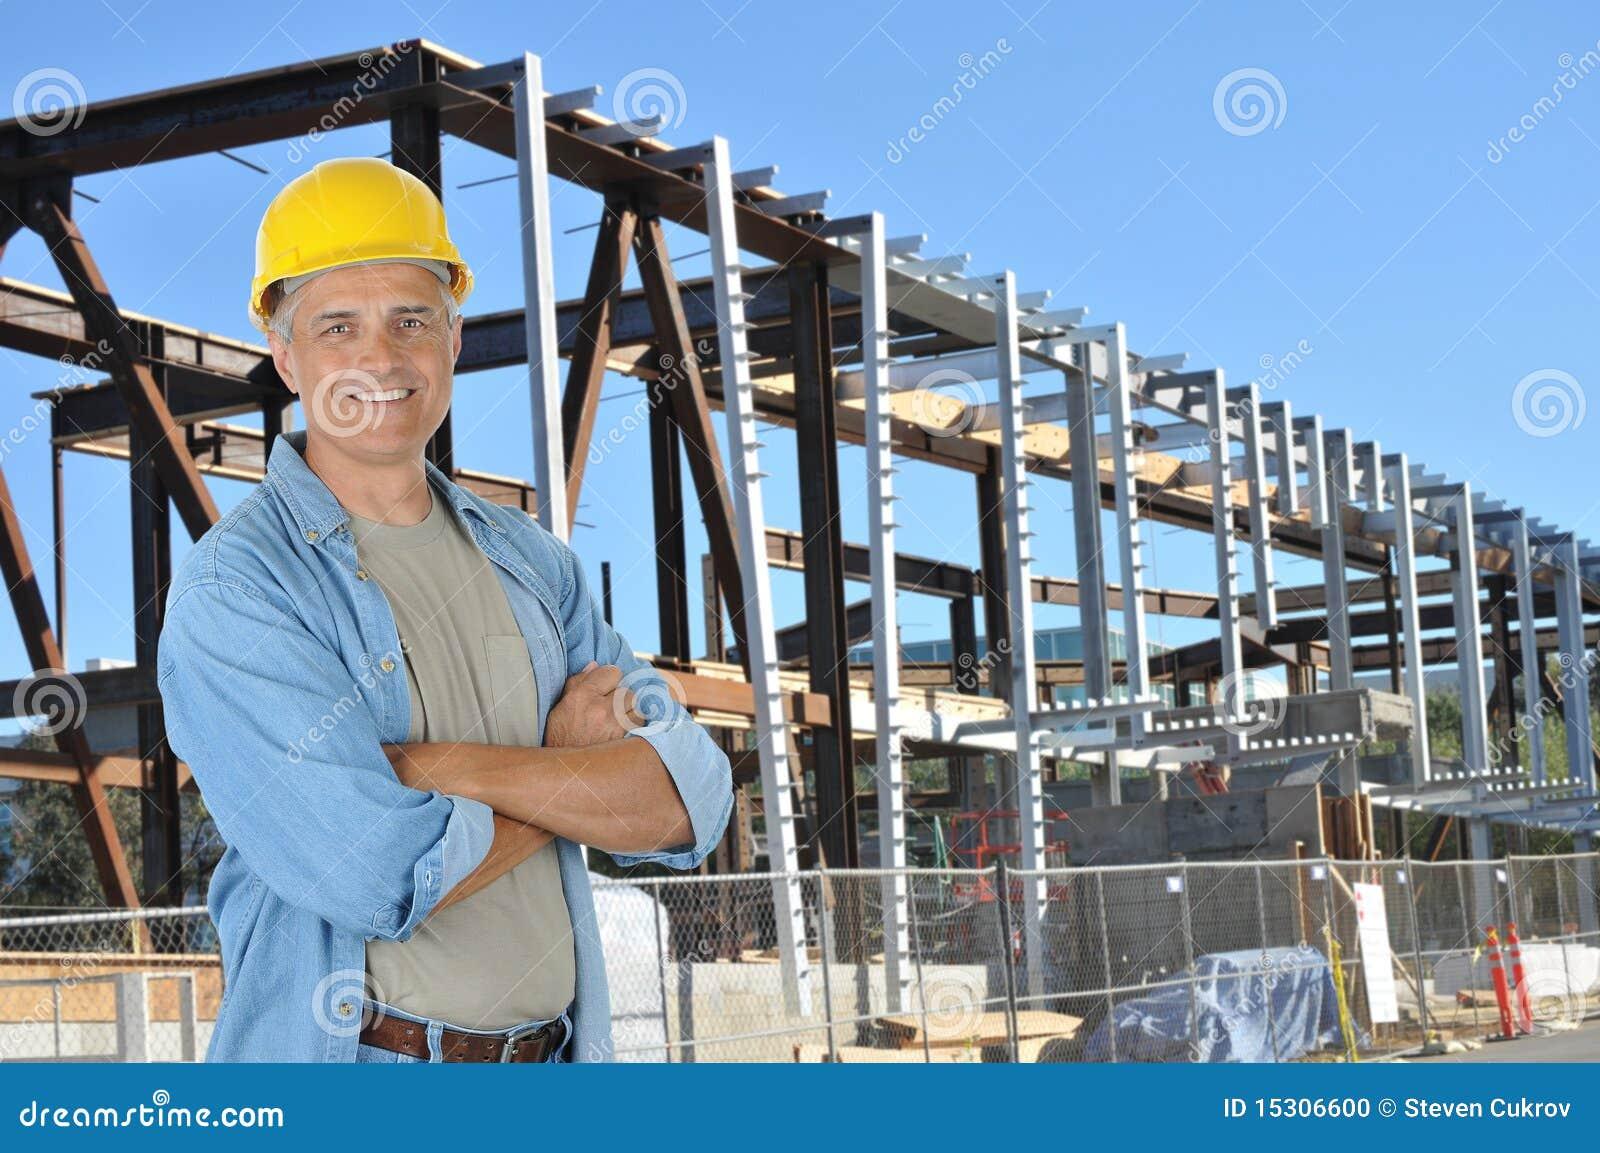 richmond safety supervisor jobs srch